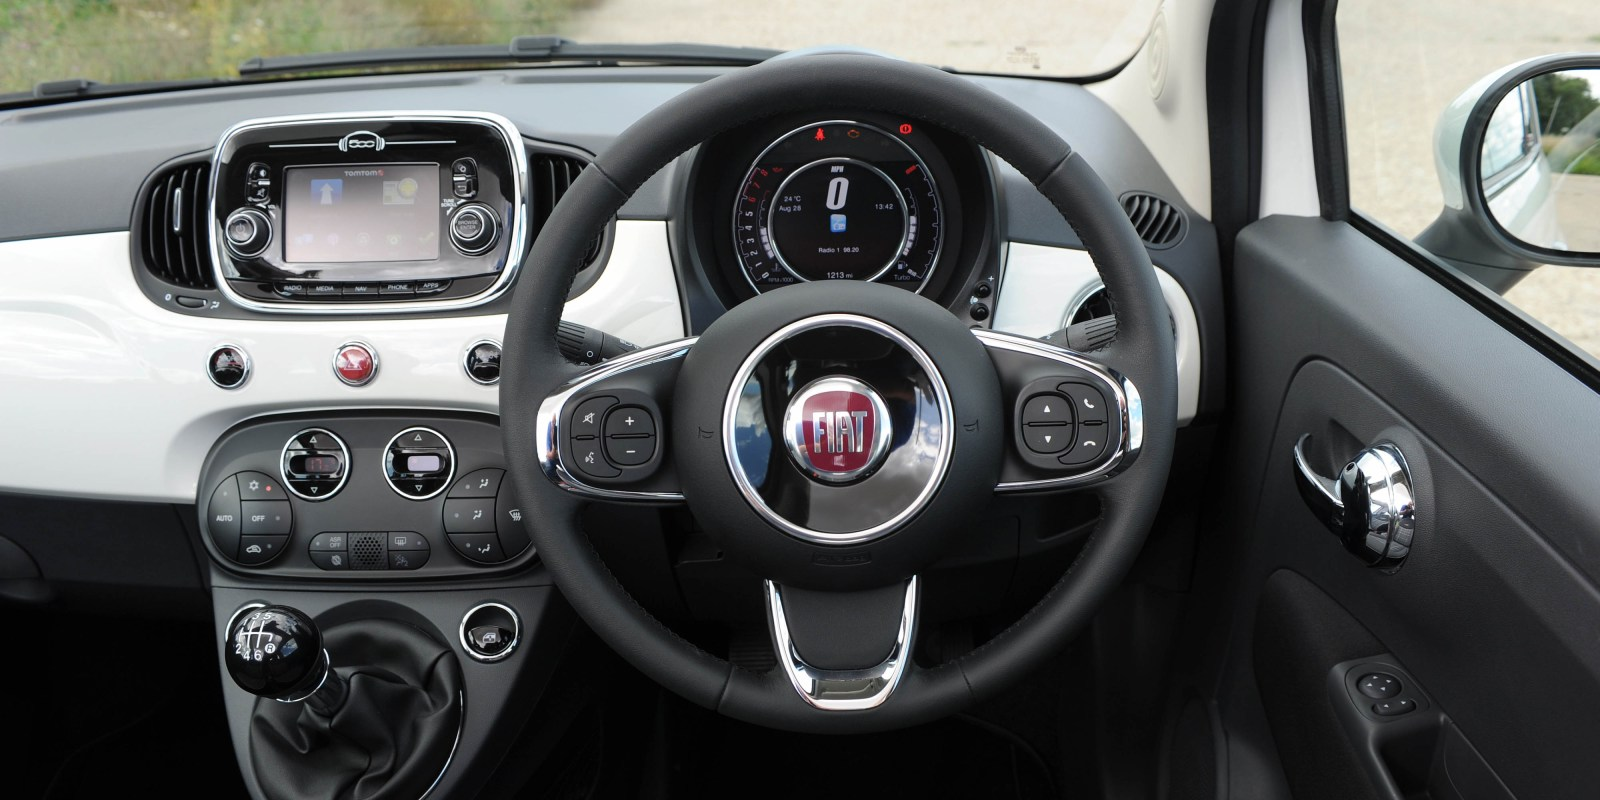 Fiat 500 Interior Amp Infotainment Carwow